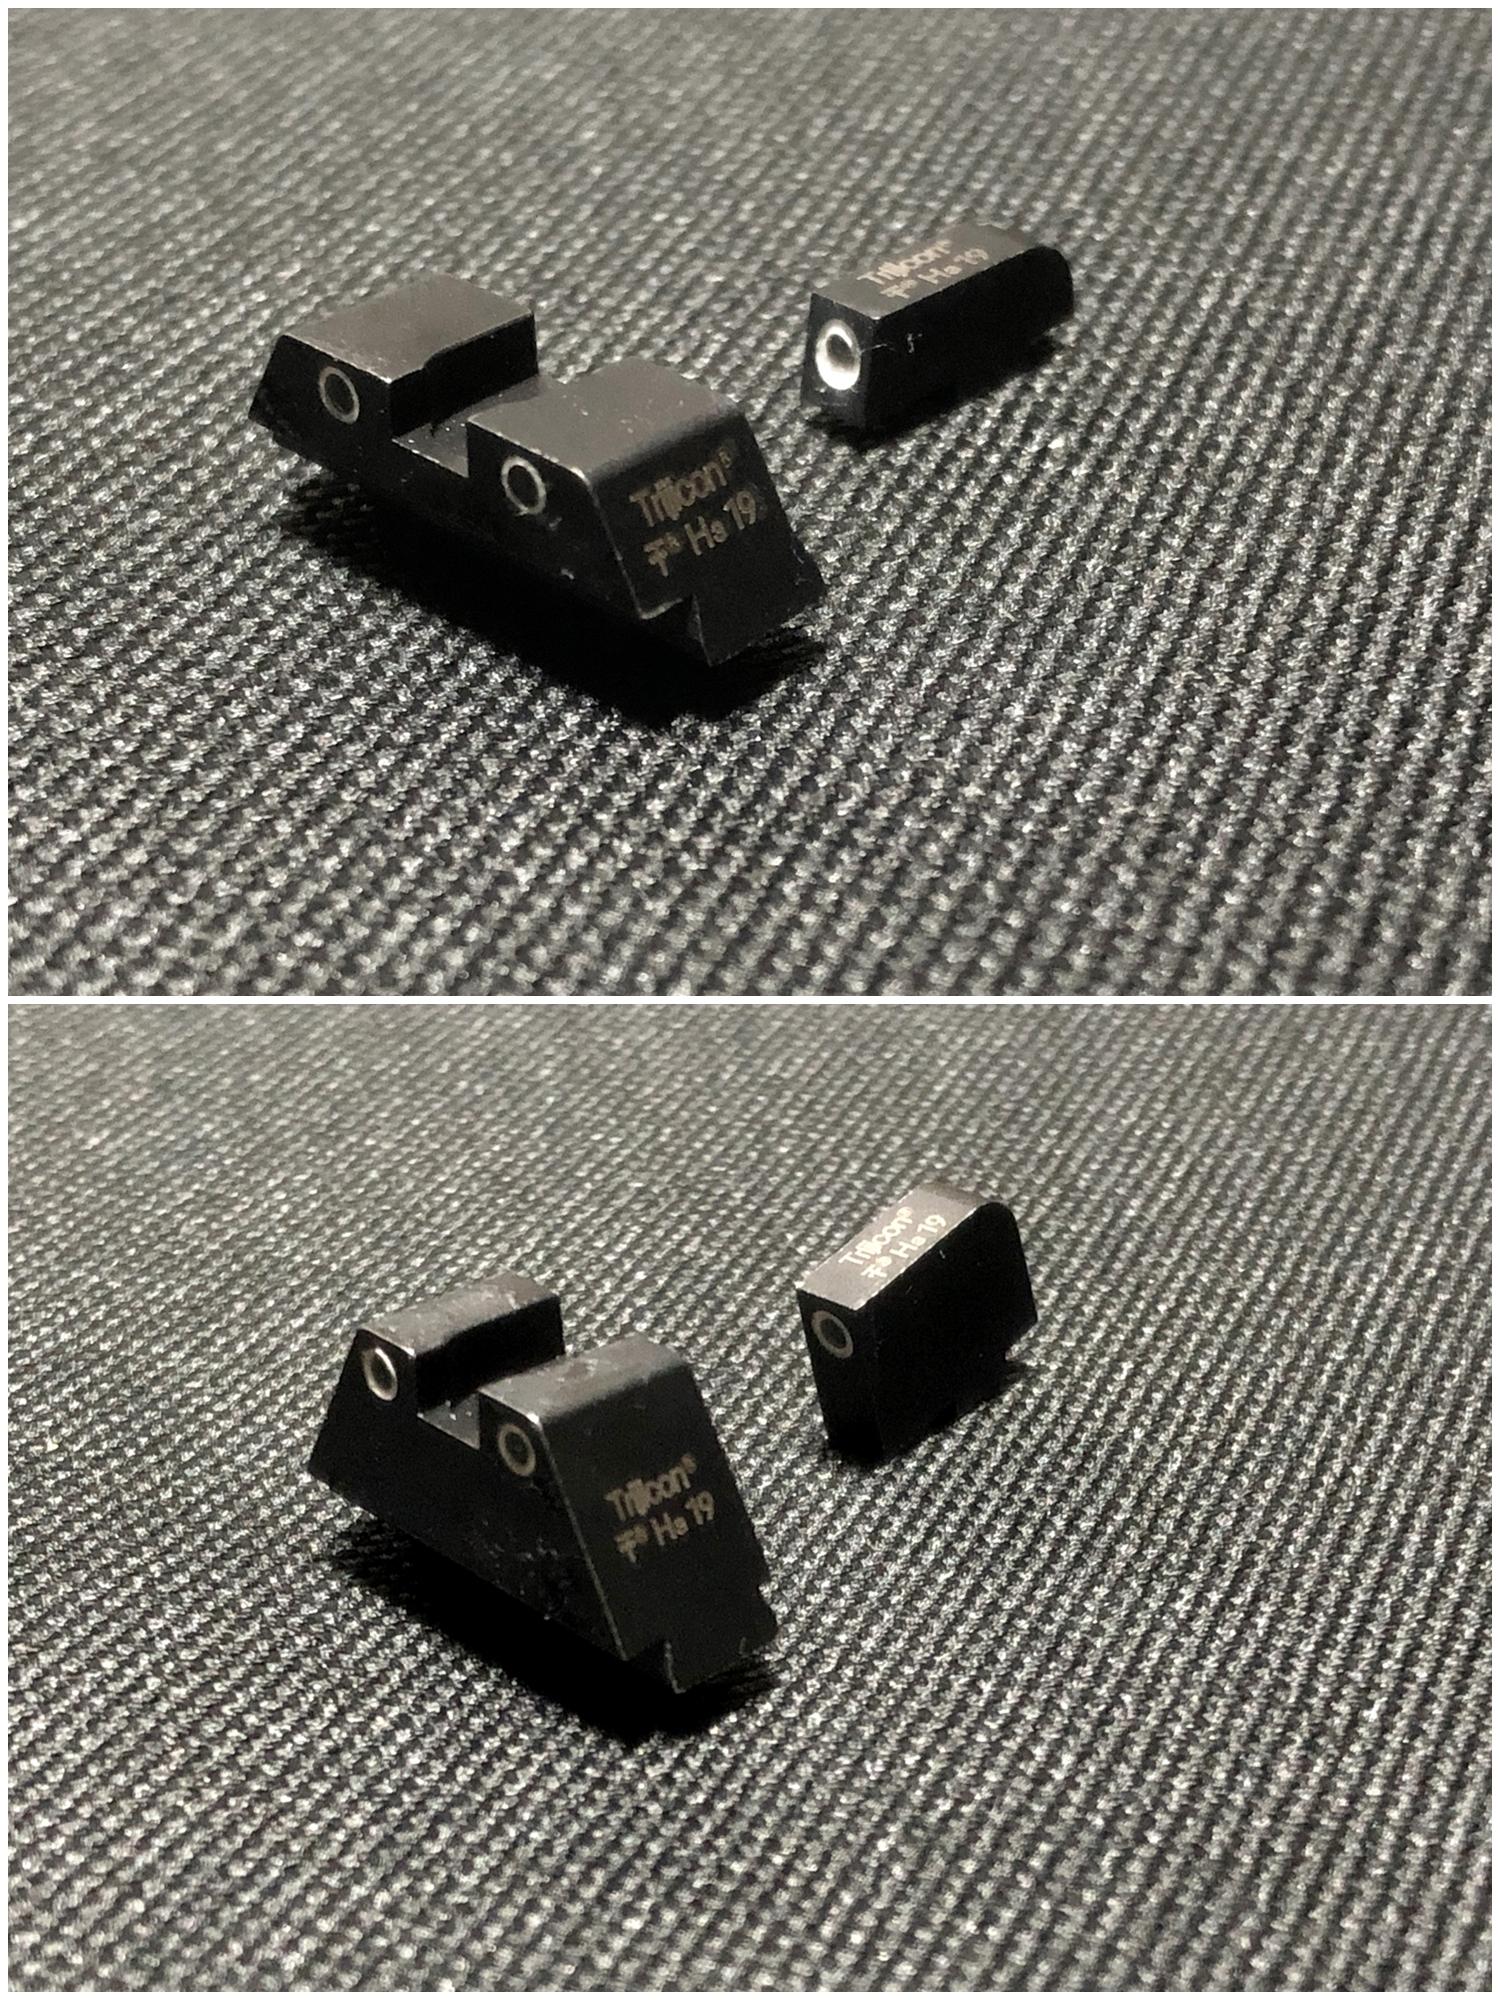 2 GLOCK Trijicon TRITIUM NIGHT SIGHTS HD HI LOW Guns Modify!! グロック トリジコン トリチウム サイト GET!! 購入 検証 取付 レビュー!! したるの巻!!